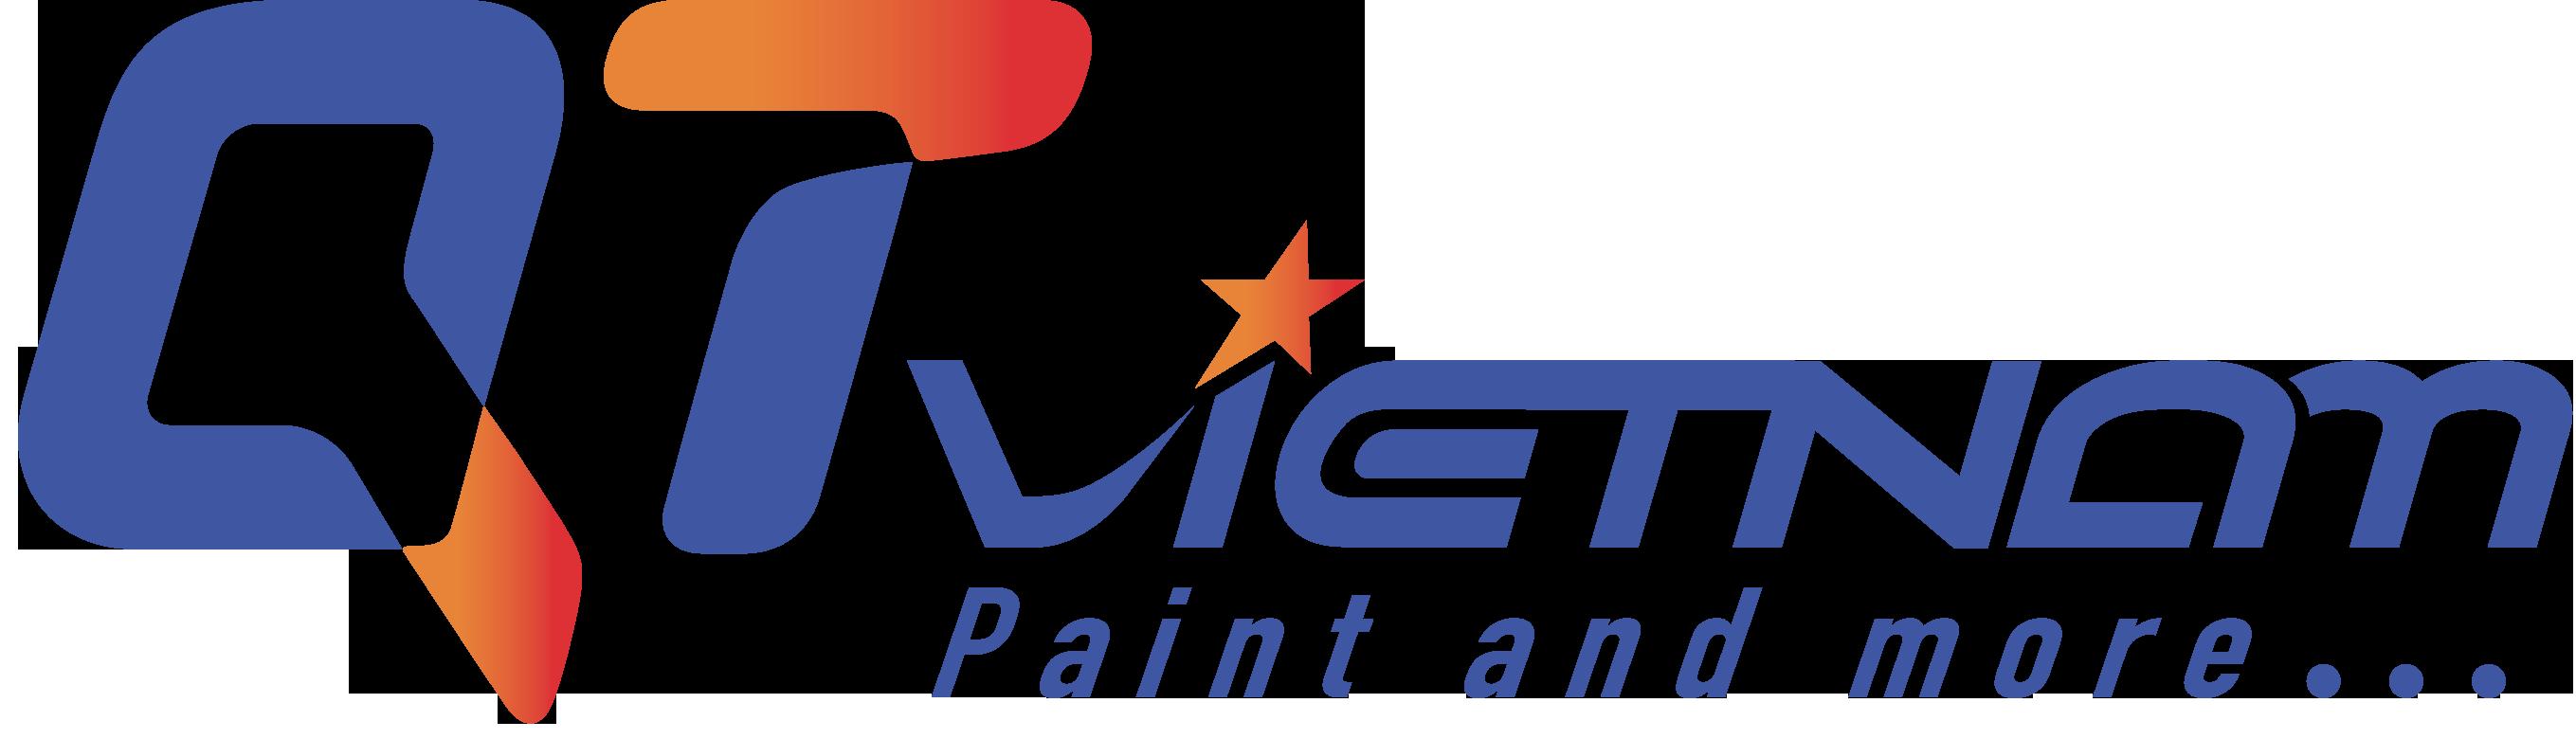 FILE_20191226_114941_QT-Vietnam_logo_final-1